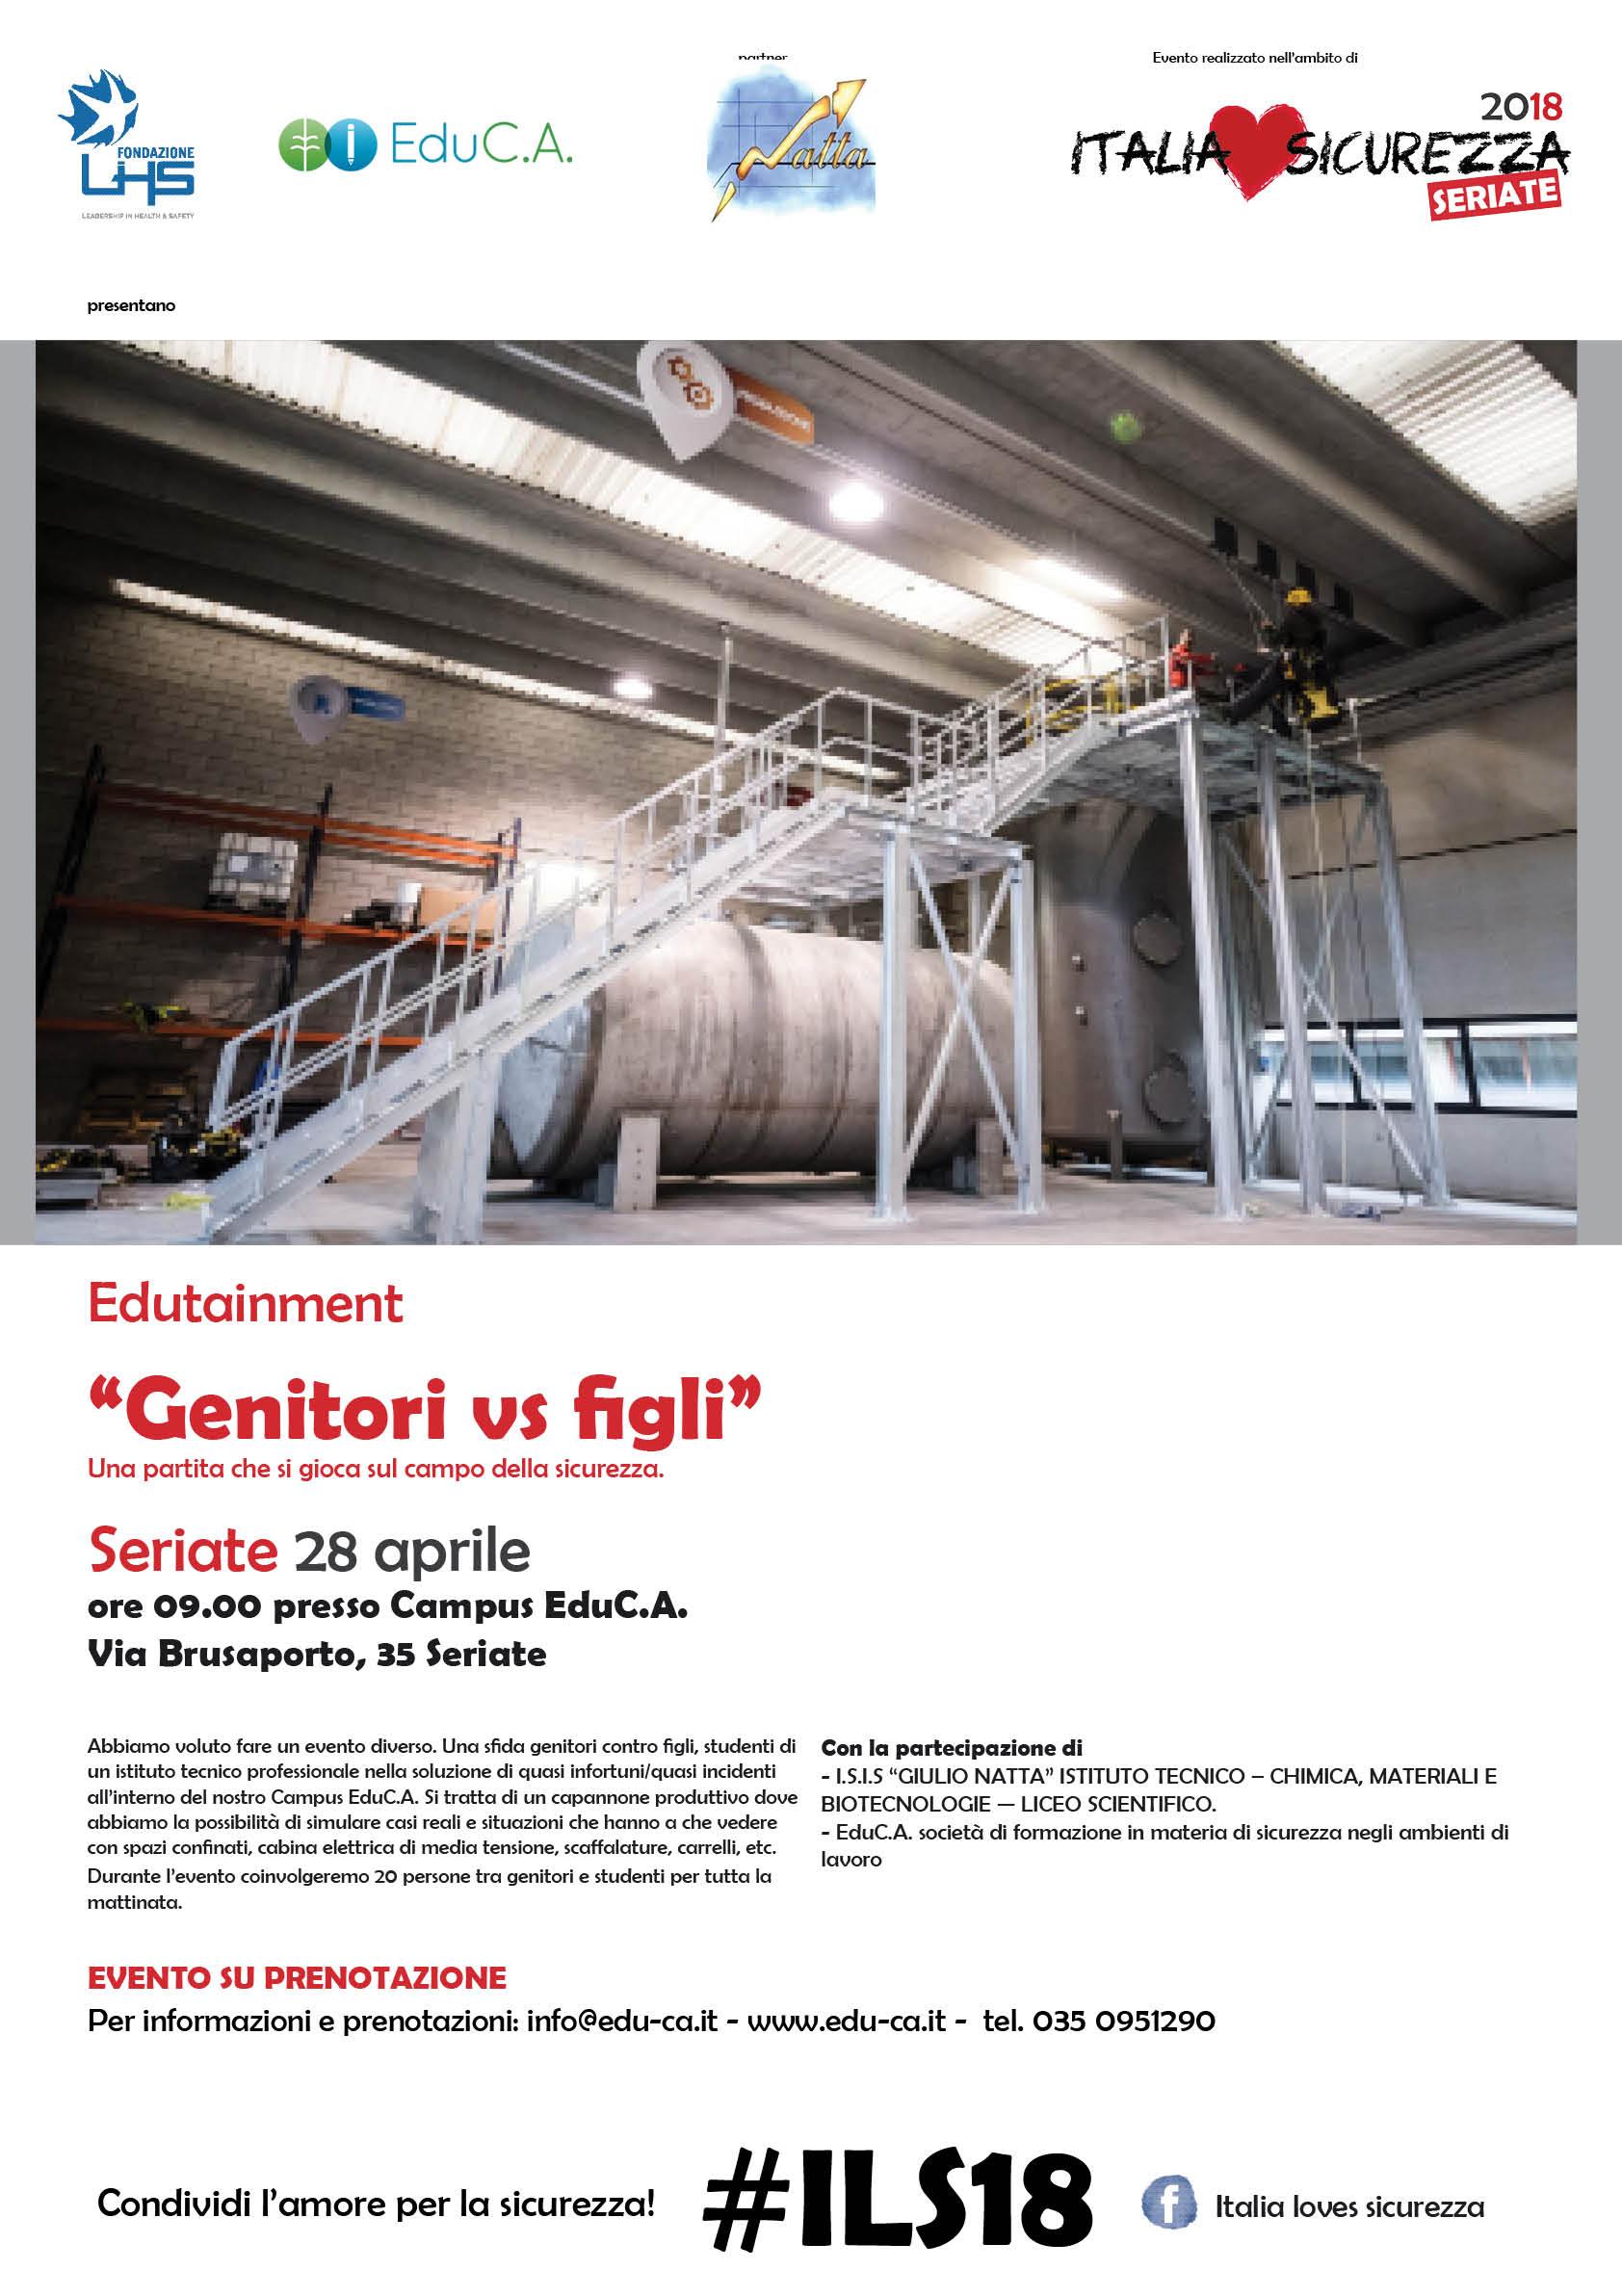 http://www.fondlhs.org/wp-content/uploads/2018/04/ILS18_Poster_EDUCA-Giasone-bassa.jpg